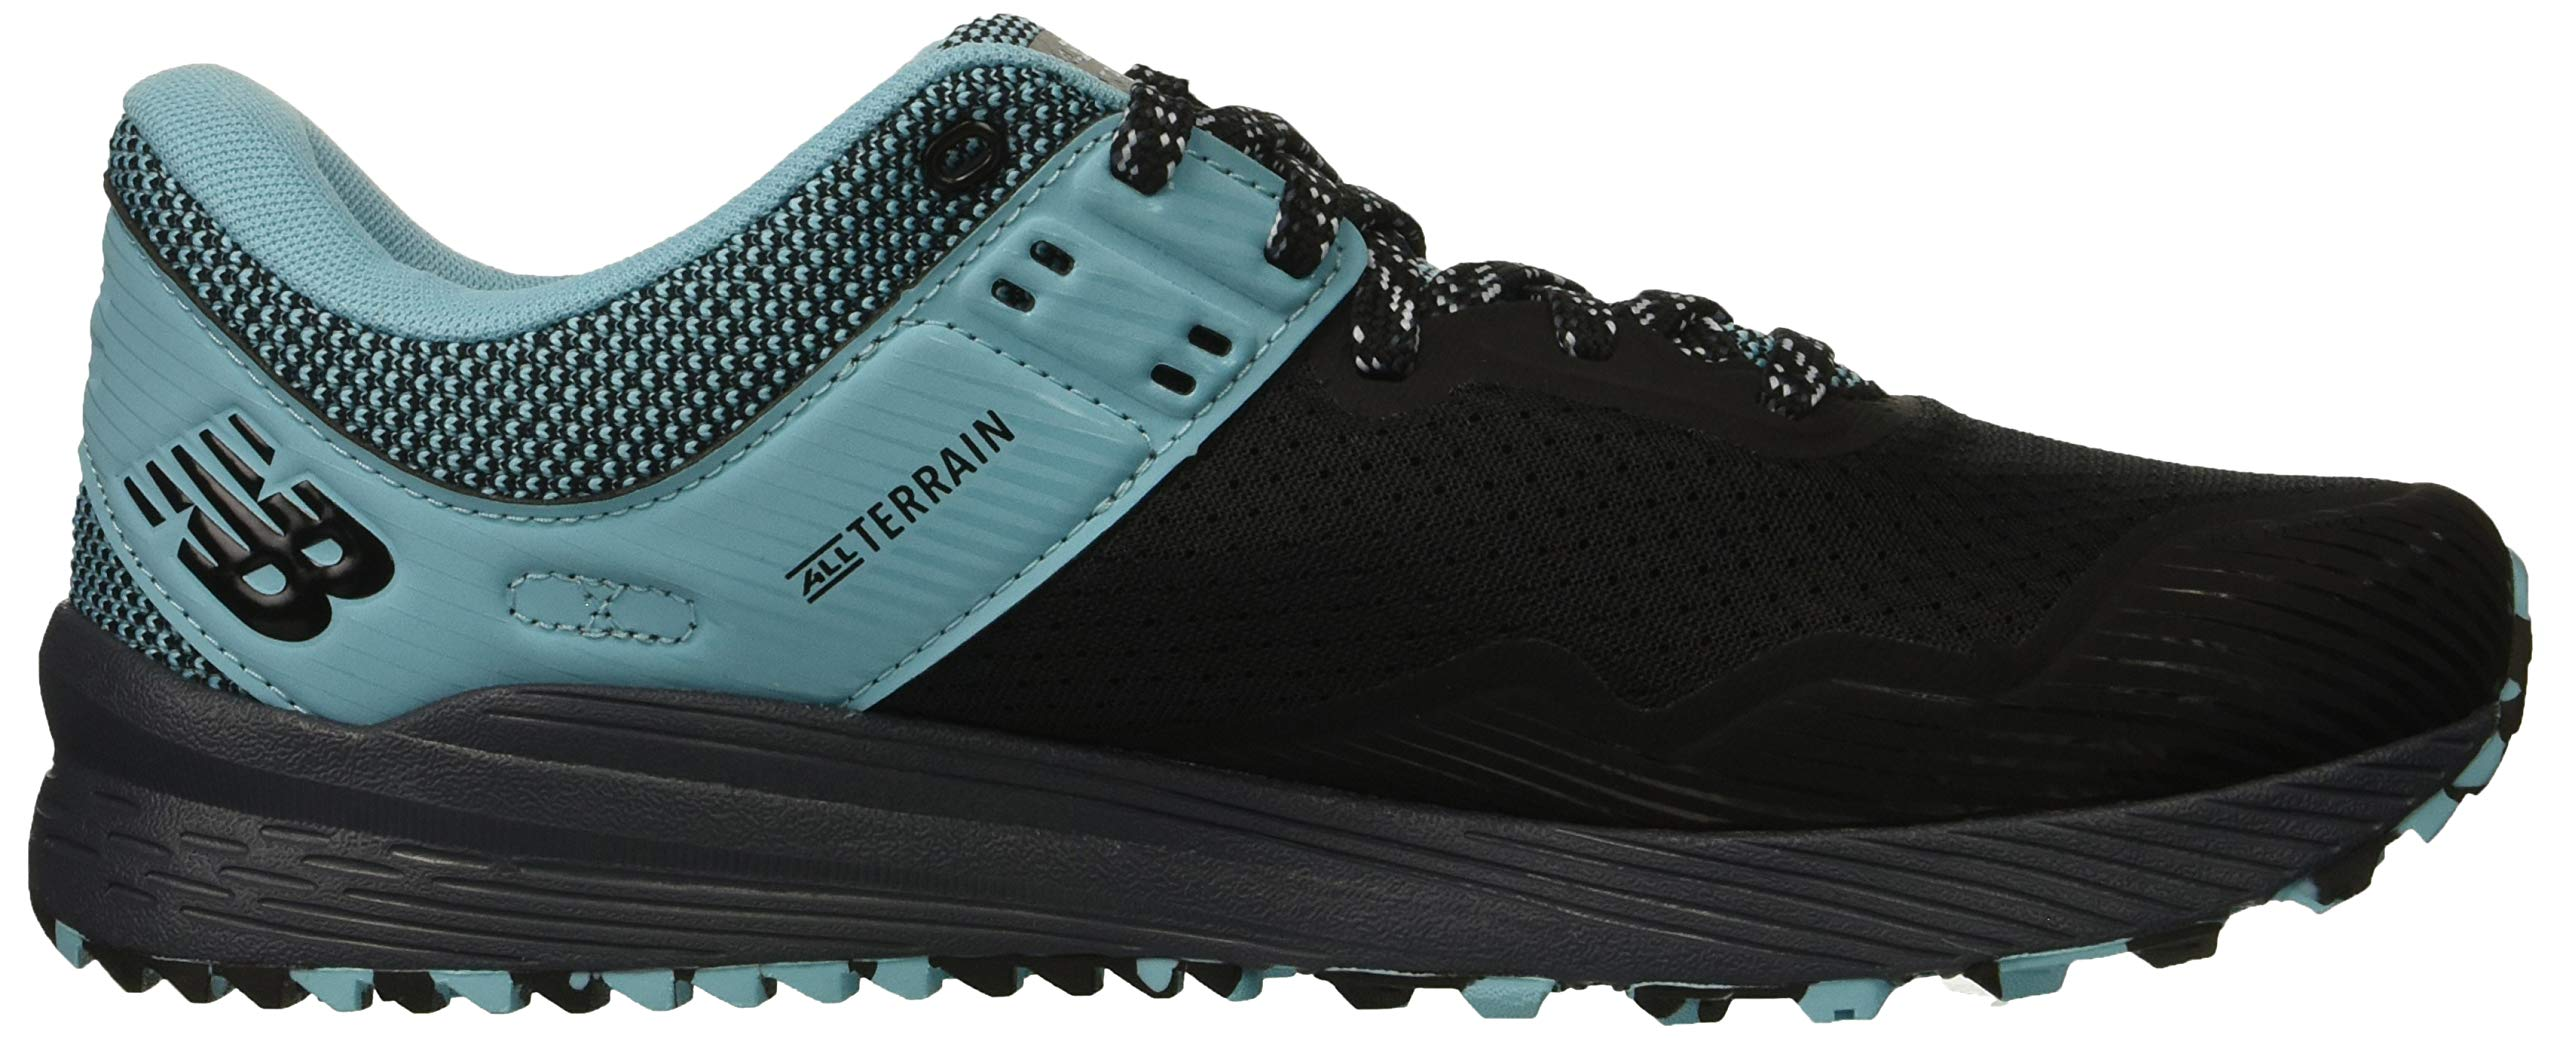 New Balance Women's Nitrel V2 FuelCore Trail Running Shoe, Black/Thunder/Enamel Blue, 6 B US by New Balance (Image #7)